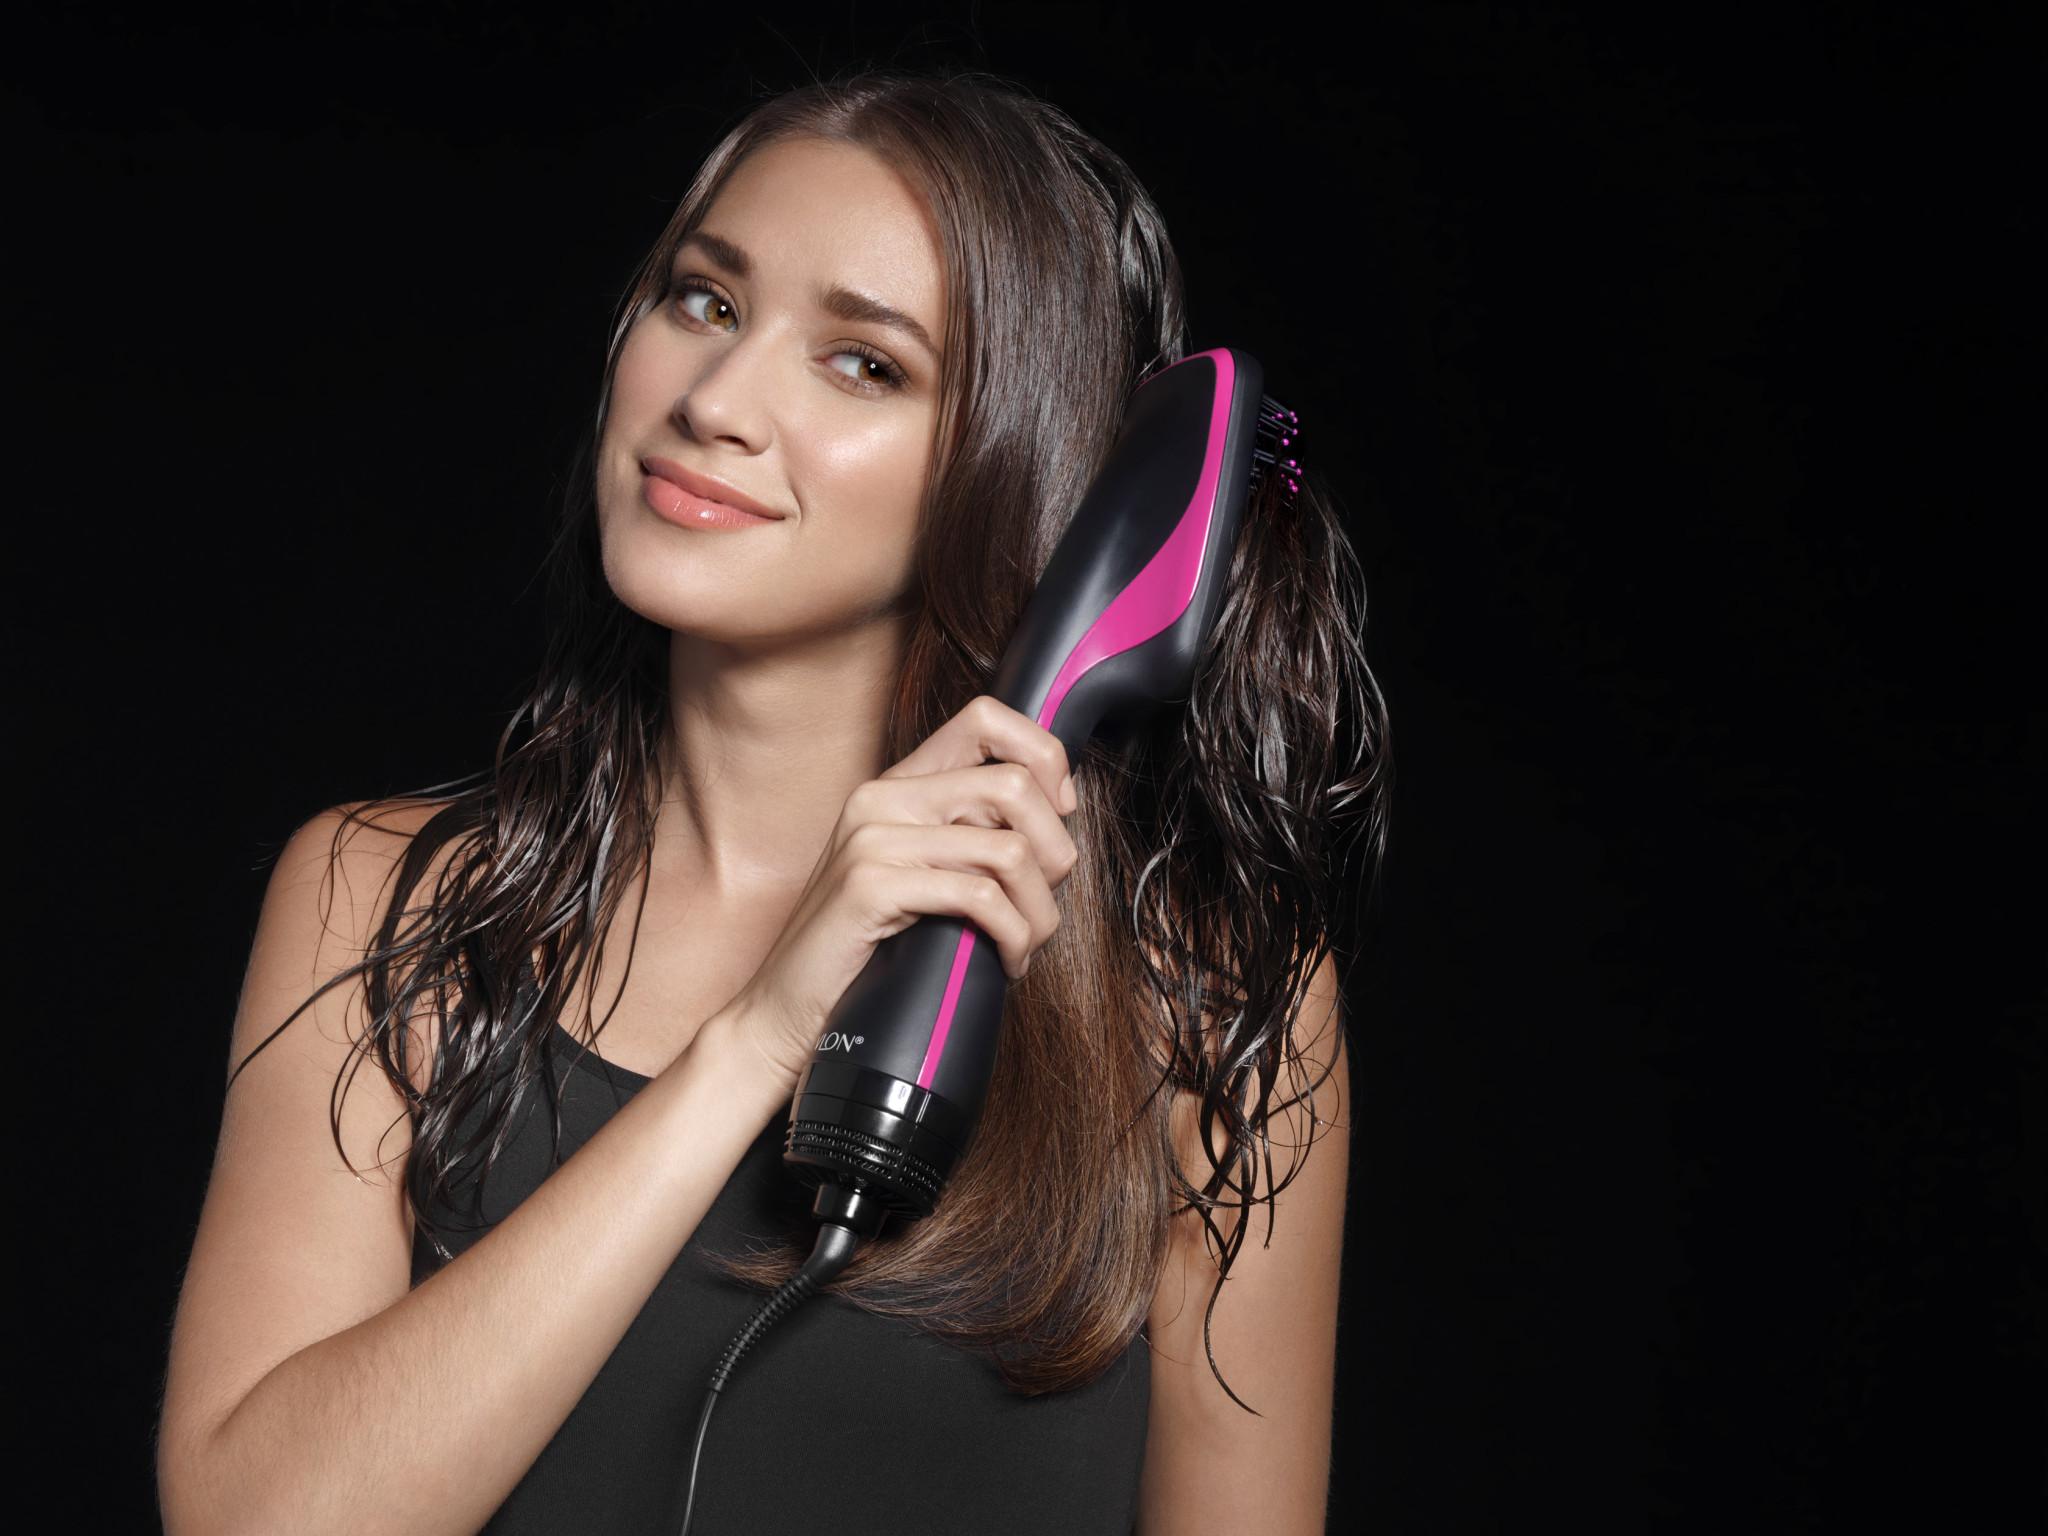 ICONIC hair dryer and styler / Revlon